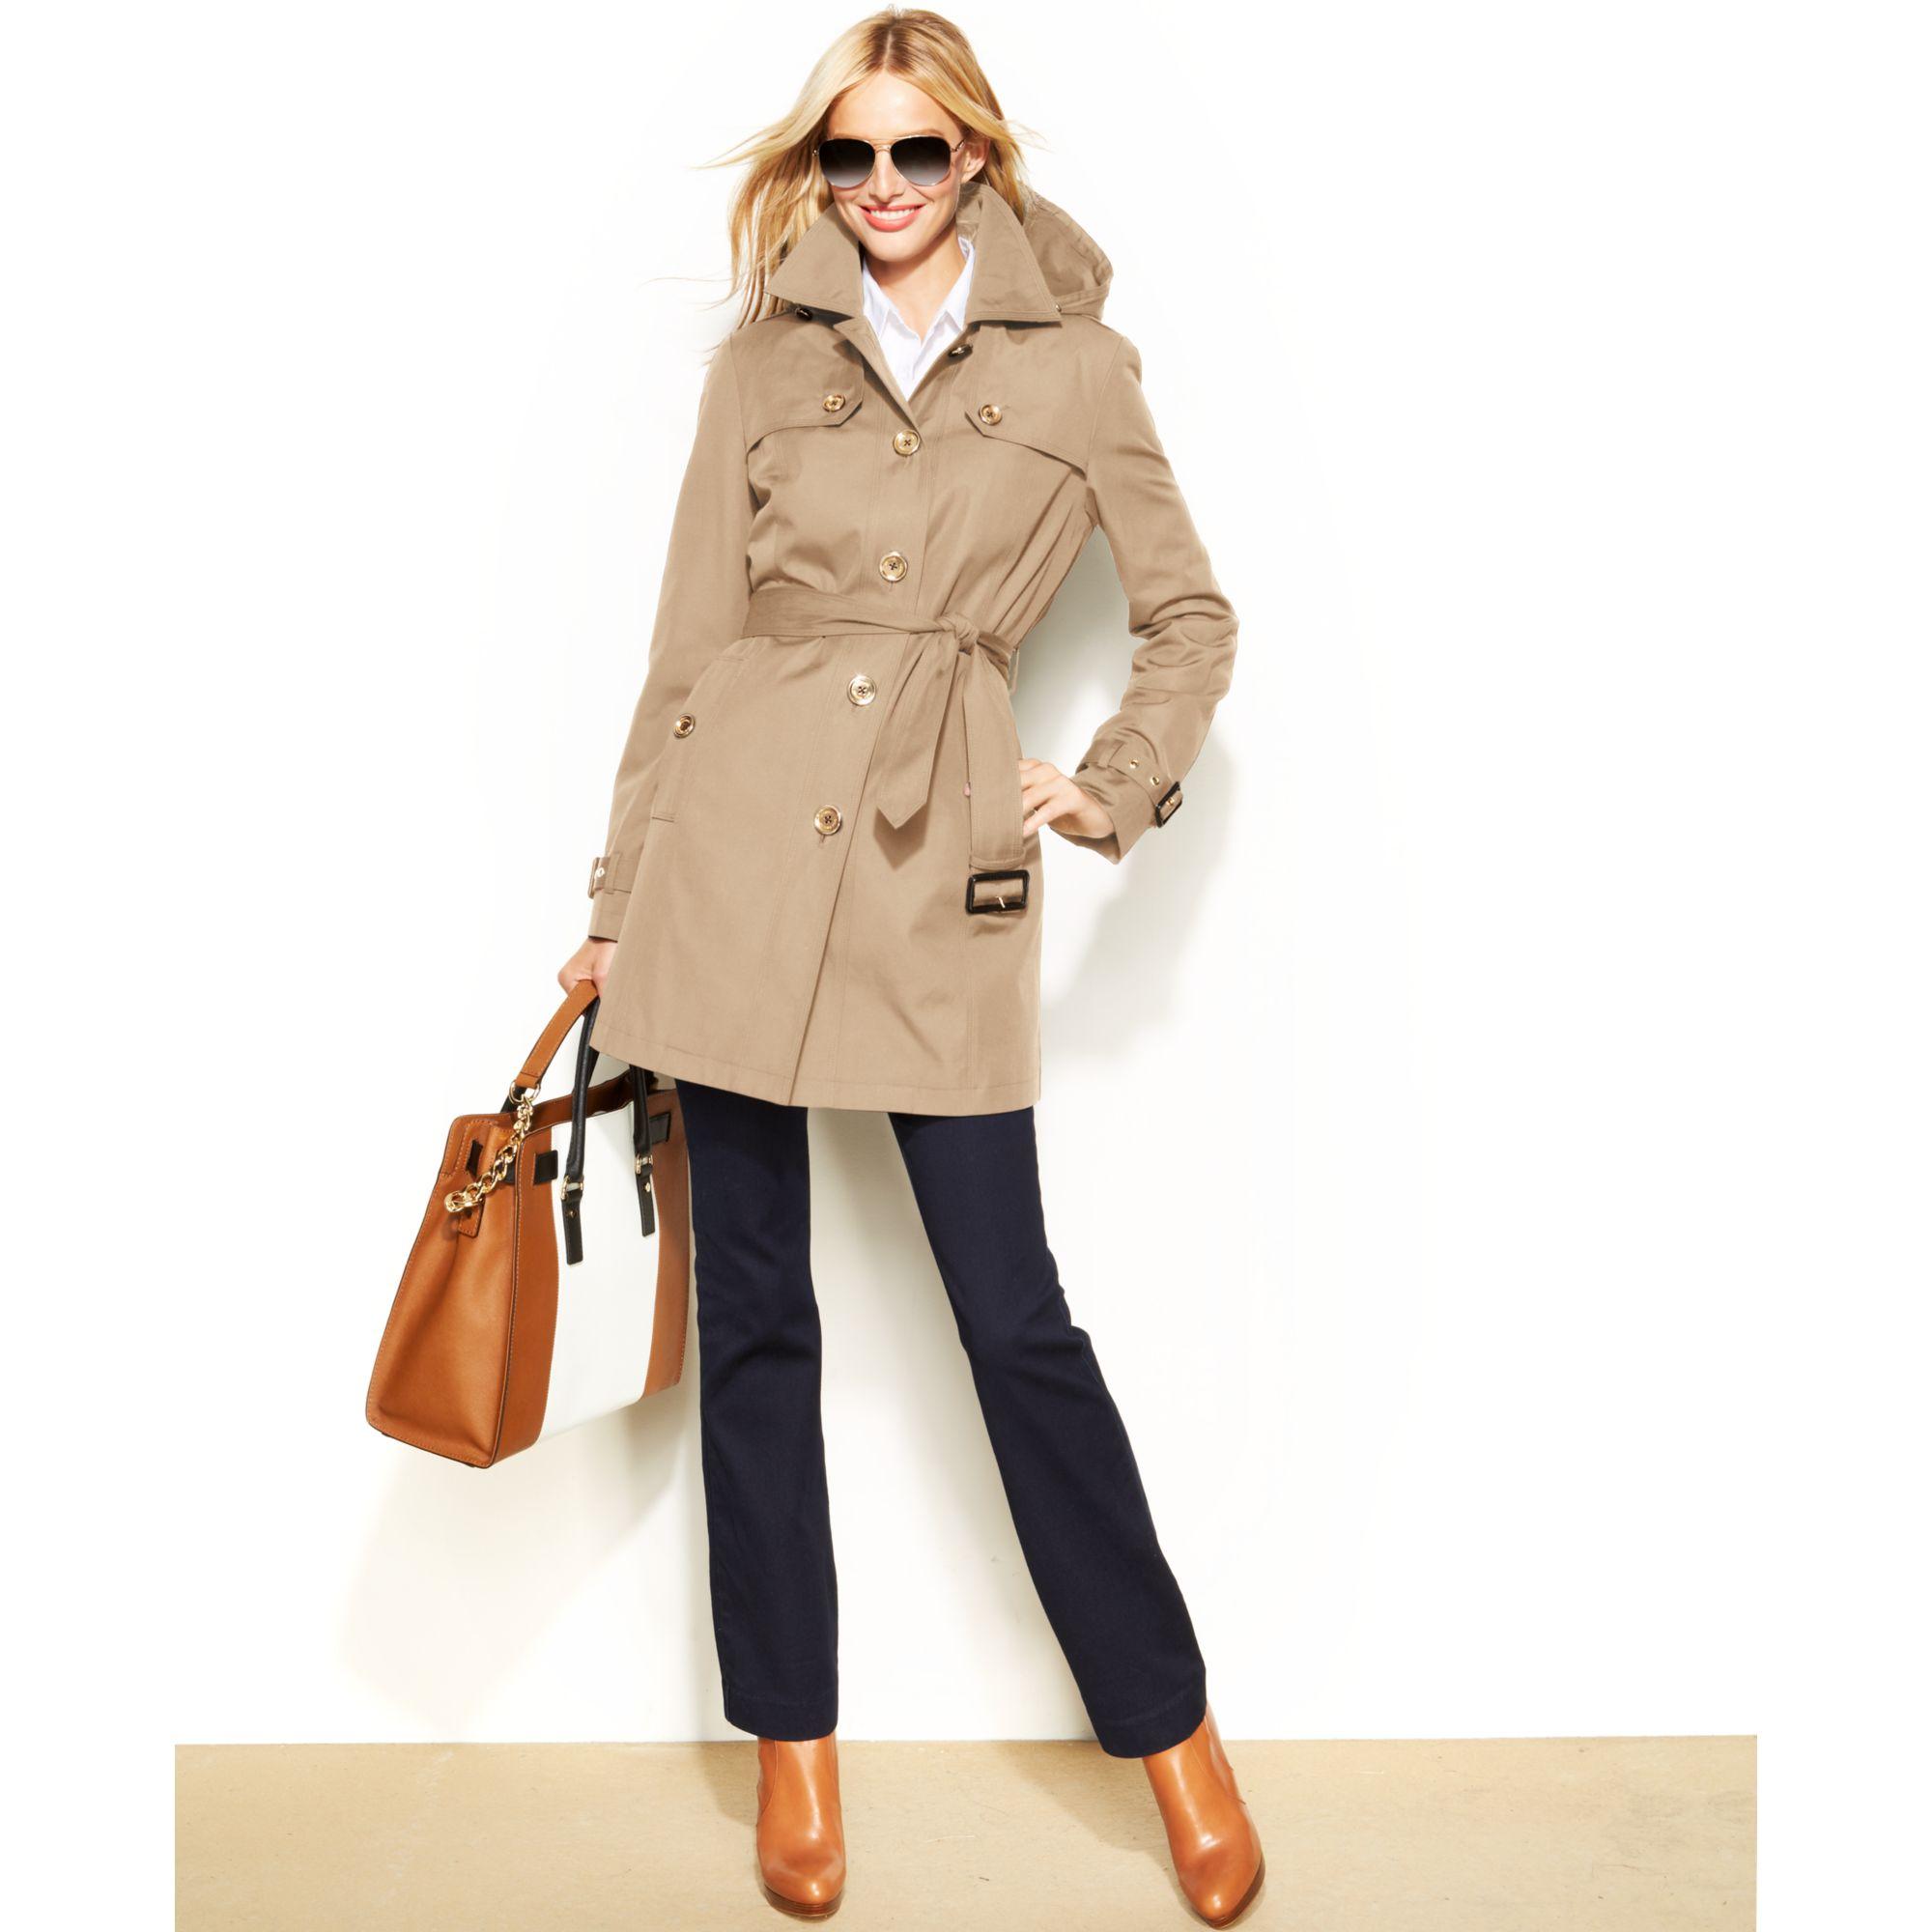 michael kor factory outlet 9n7n  michael kors trench coat